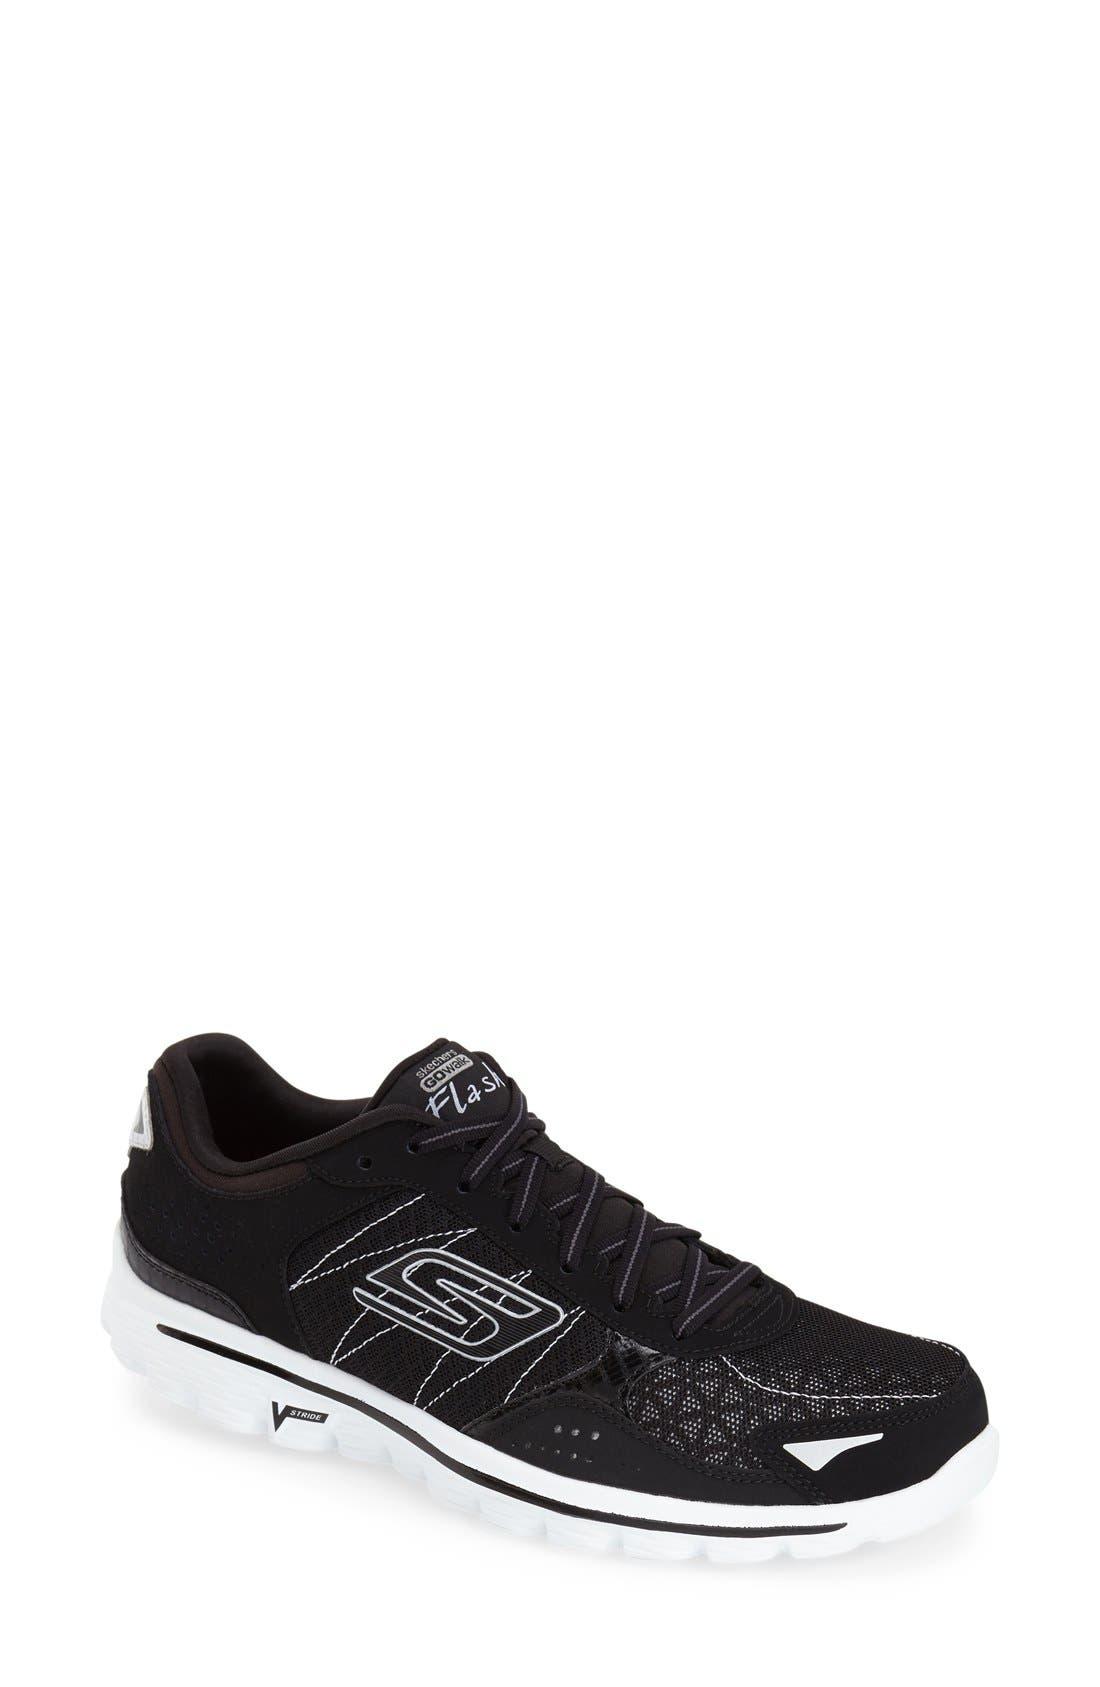 Alternate Image 1 Selected - SKECHERS 'GOwalk 2 - Flash' Sneaker (Women)